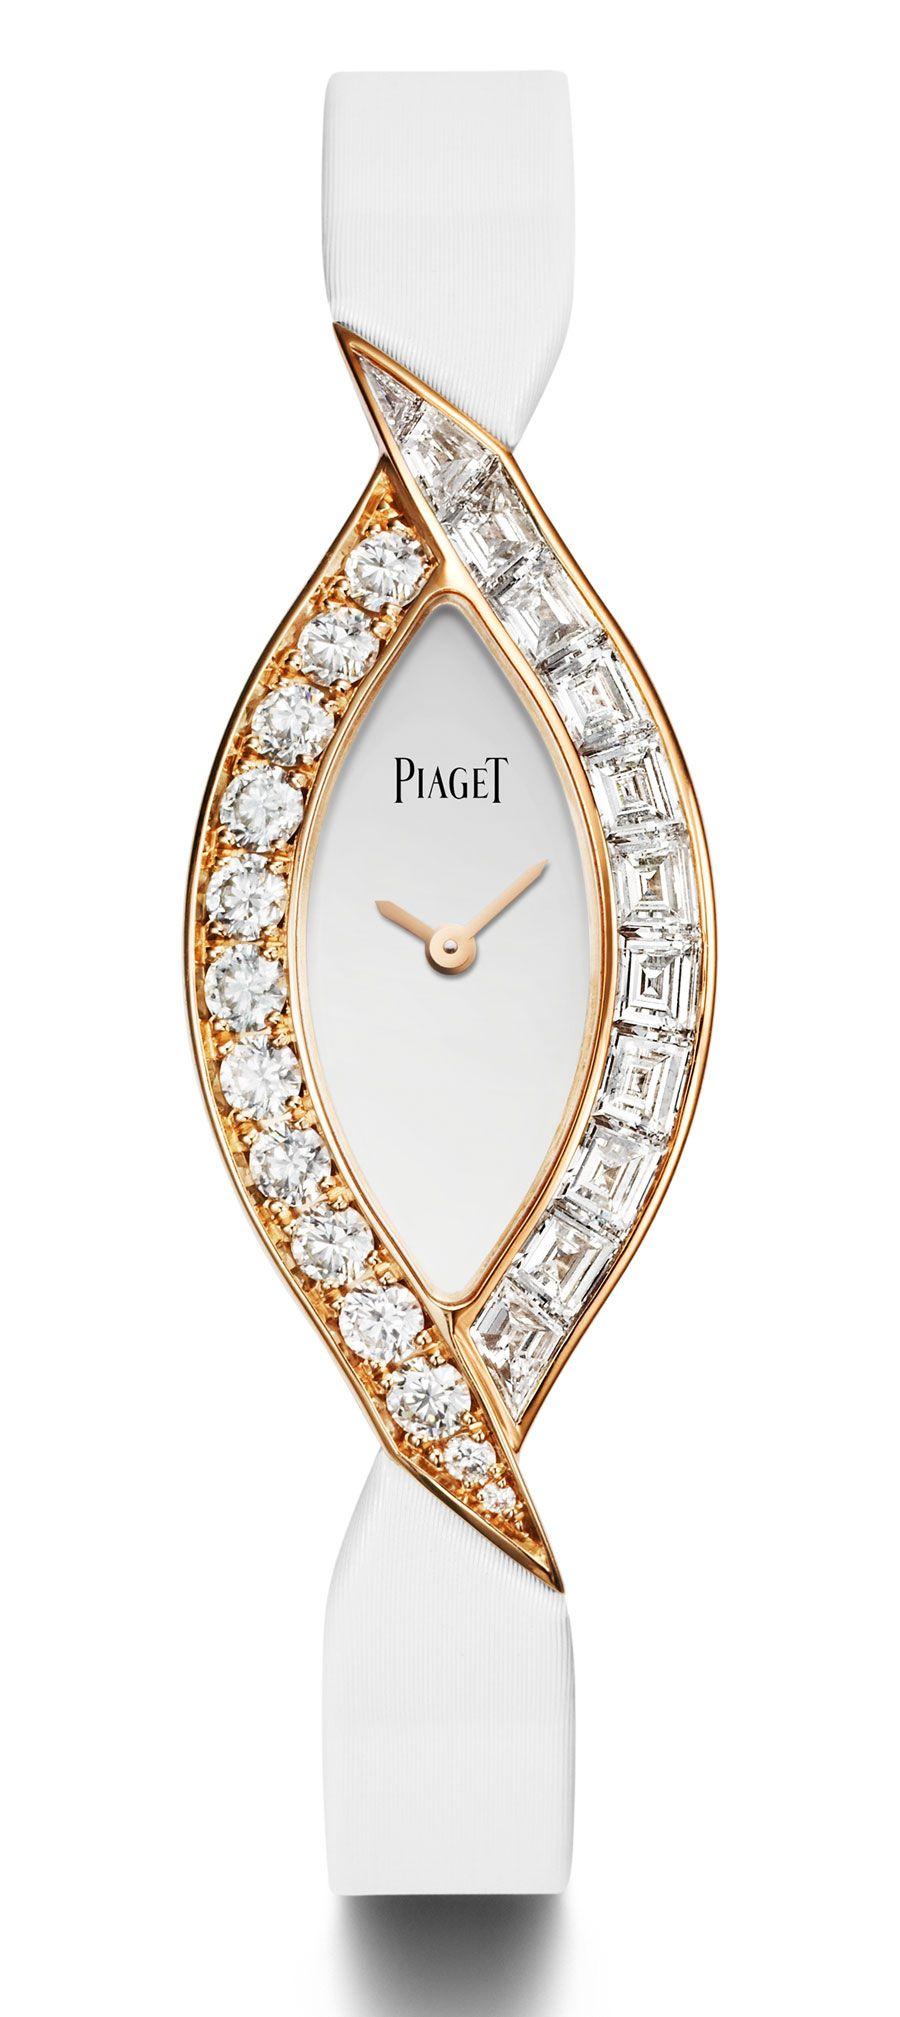 0e20f274064e Piaget Couture Précieuse diamond and rose gold jeweller watch ...